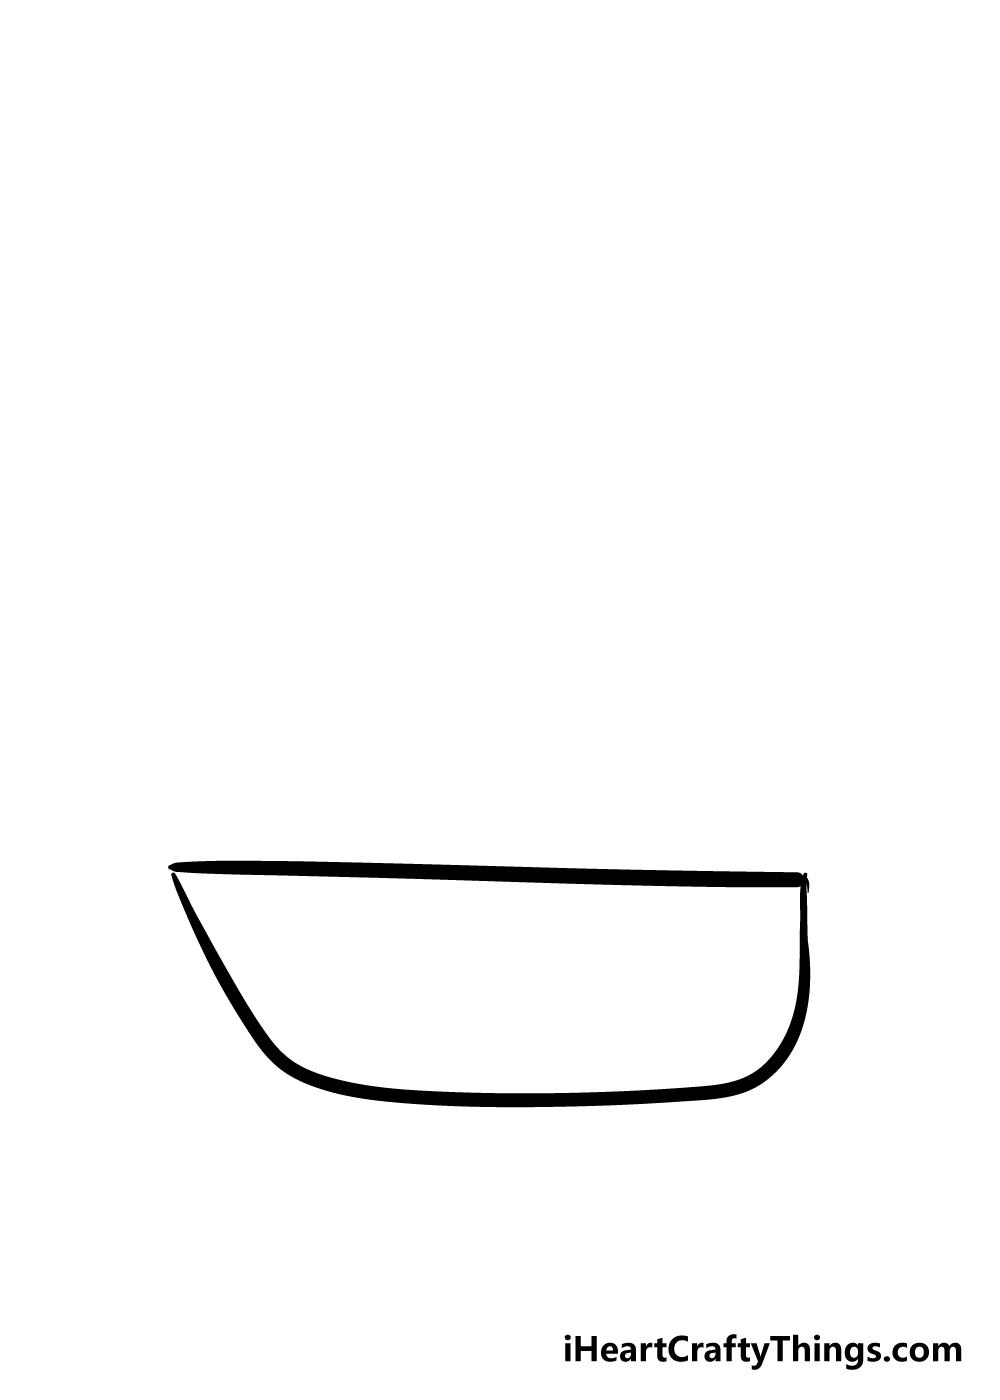 boat drawing step 1